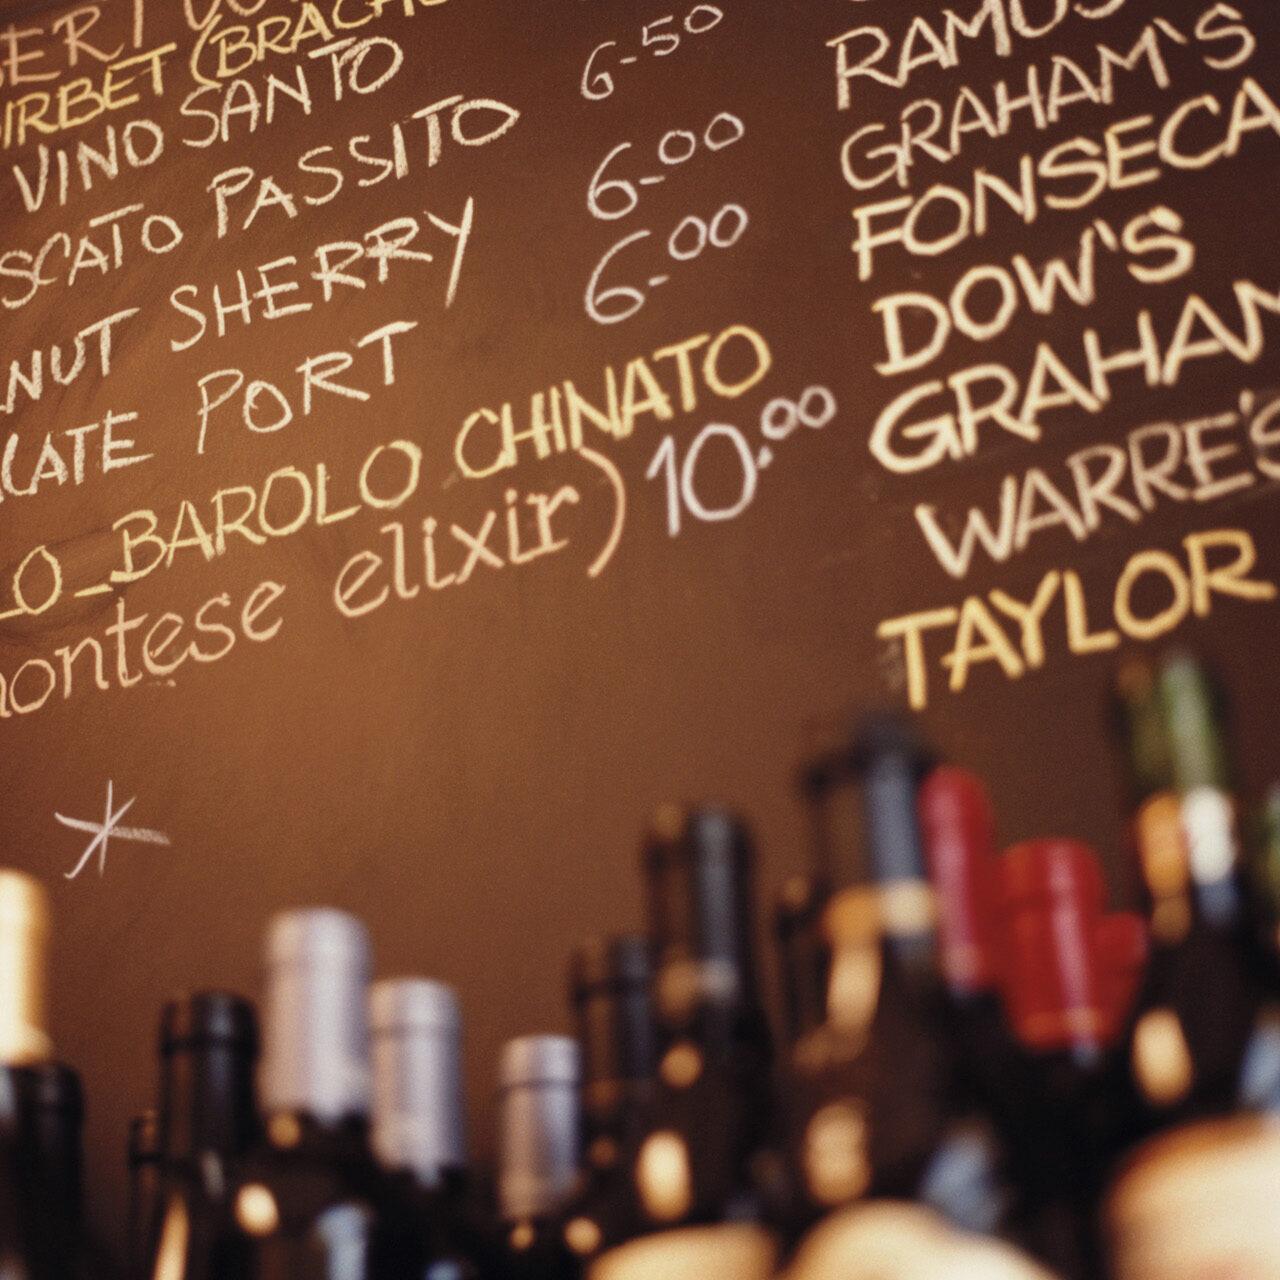 Chalkboard in restaurant with wine menu, wine bottles in foreground